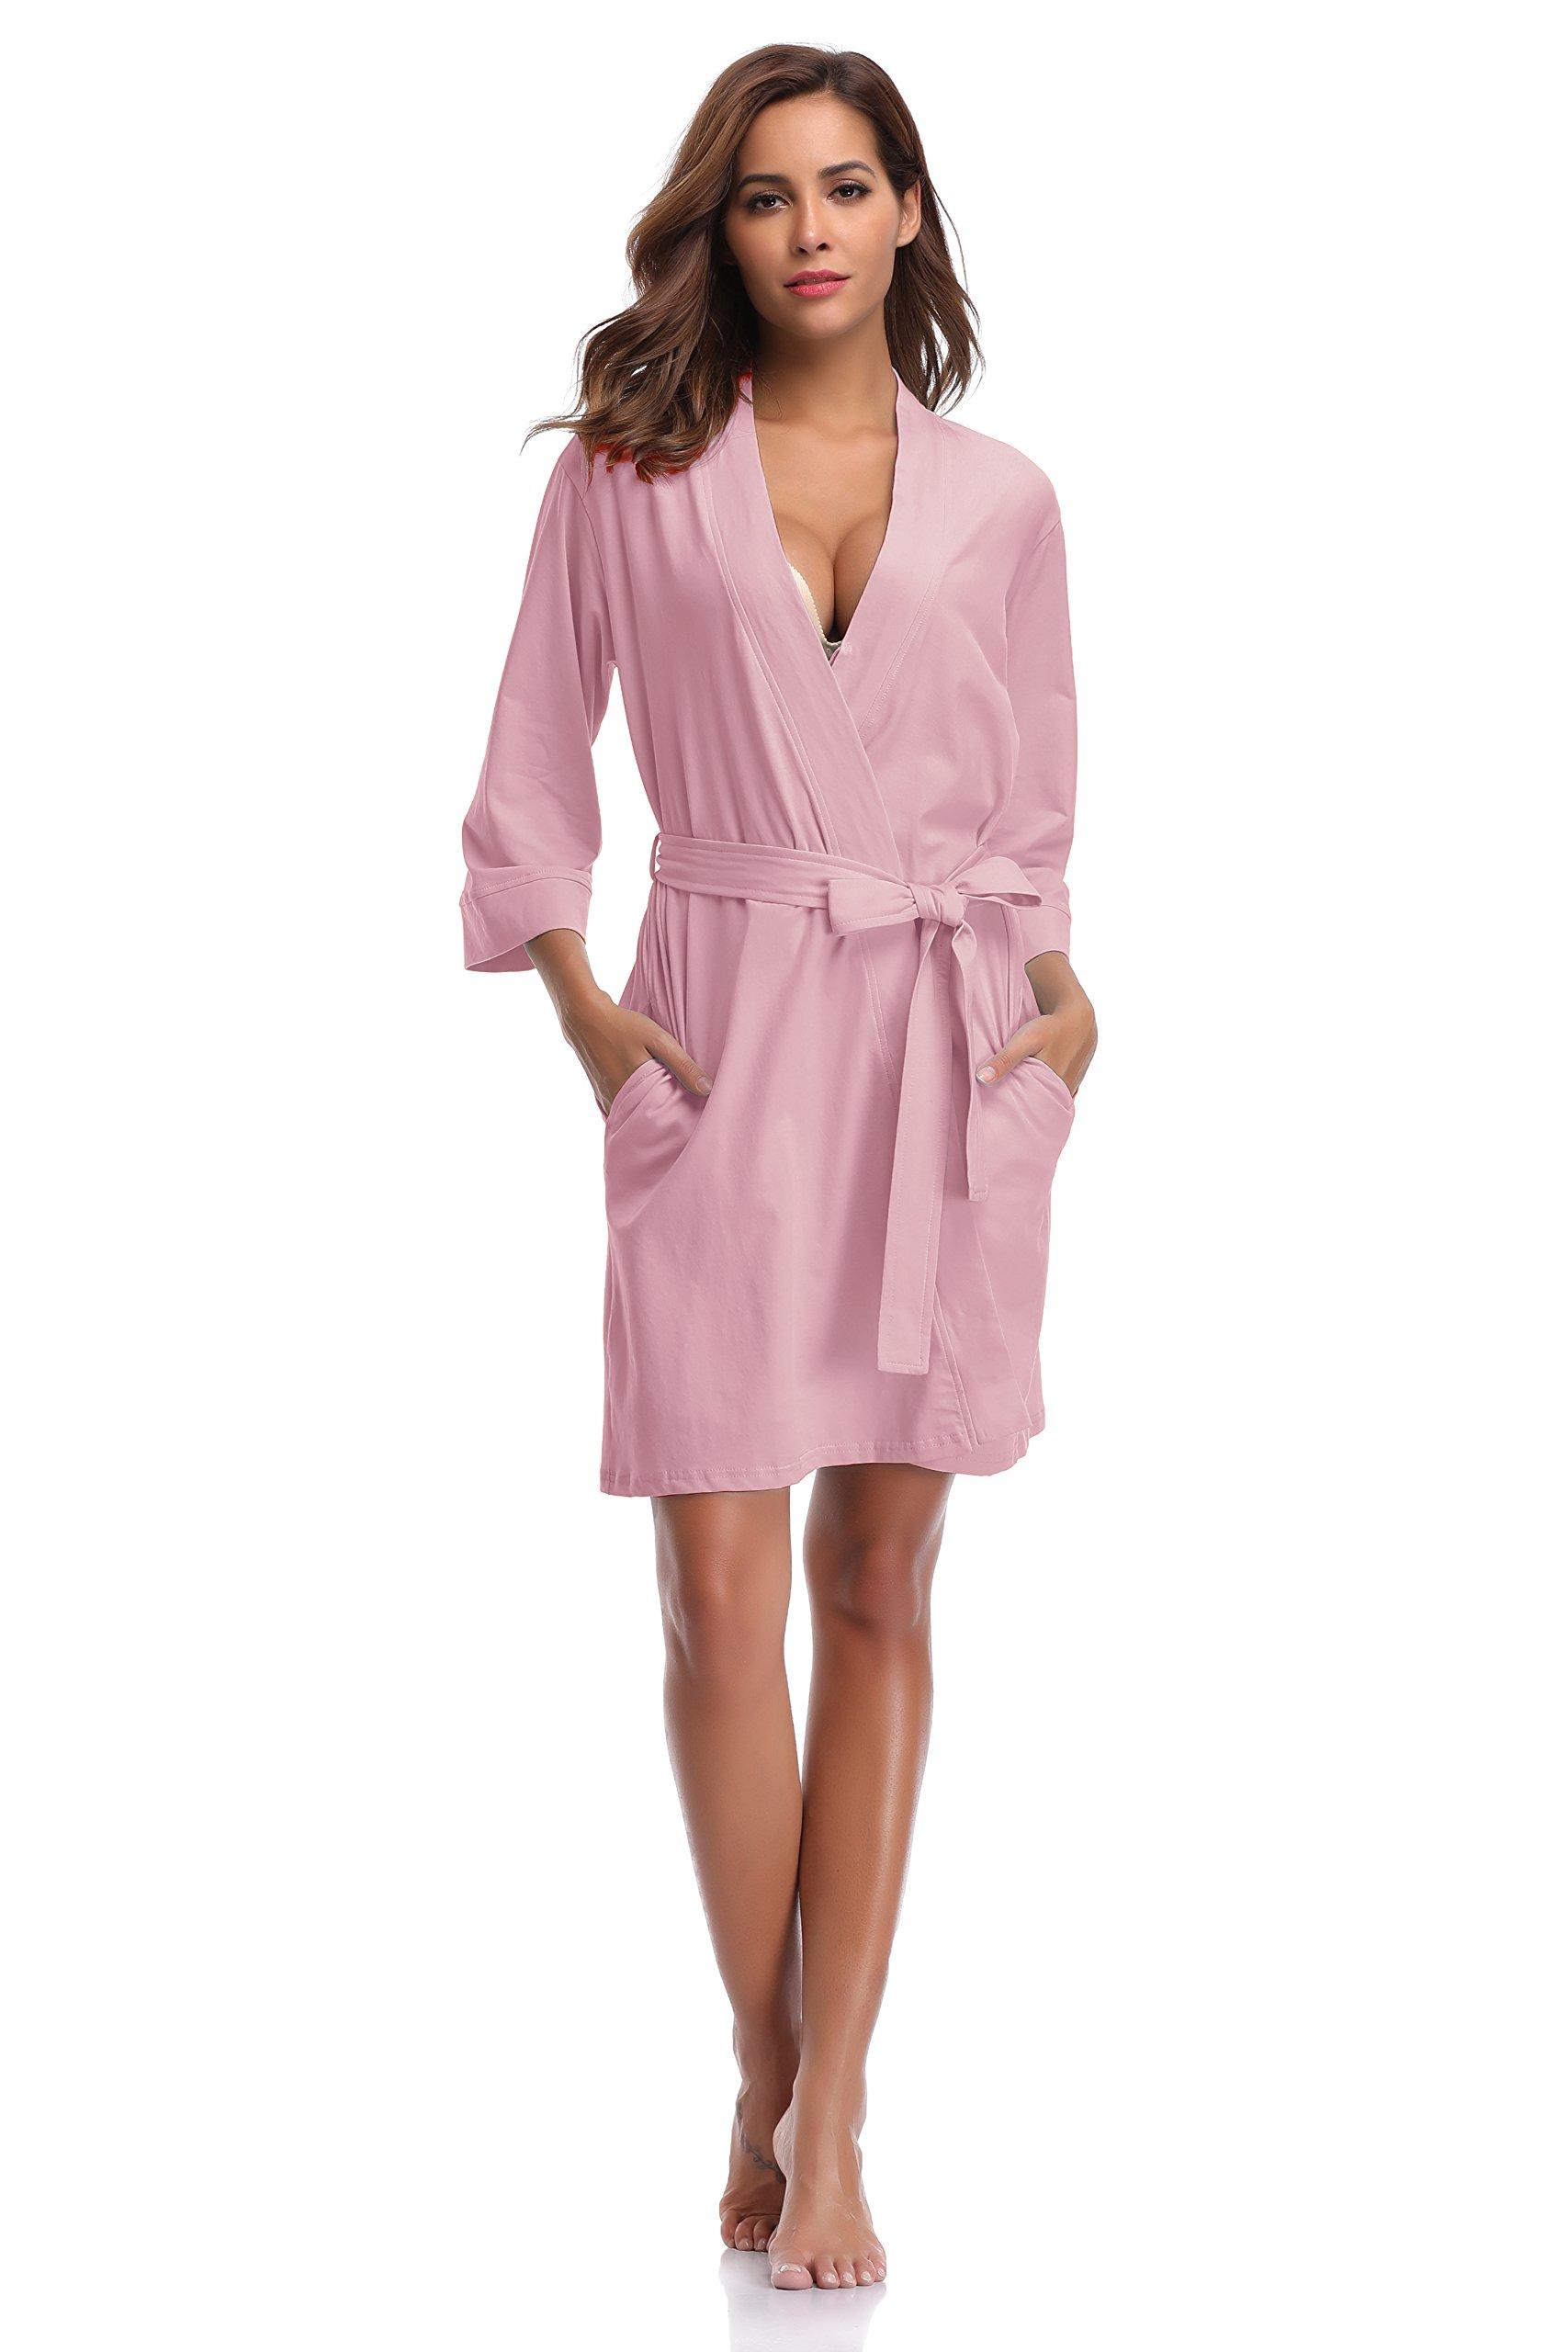 Luvrobes Women's Cotton Knit Kimono Robe (Light Pink, Large) by Luvrobes (Image #1)